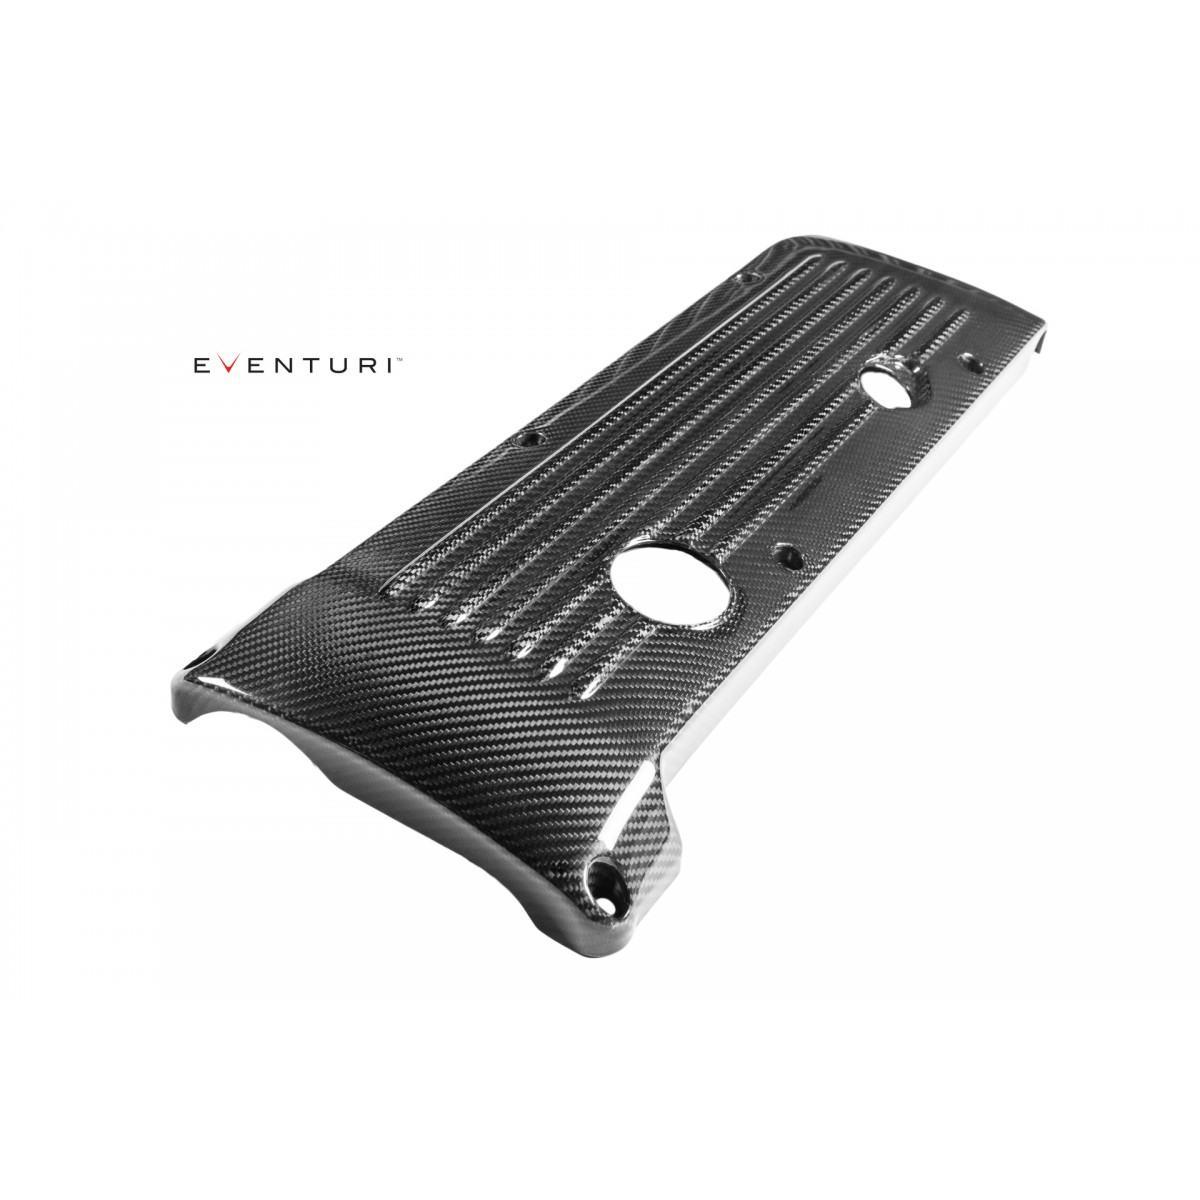 Bmw Z4m Coupe For Sale: Eventuri Carbon Motorabdeckung BMW (S54 Motor) E46 M3